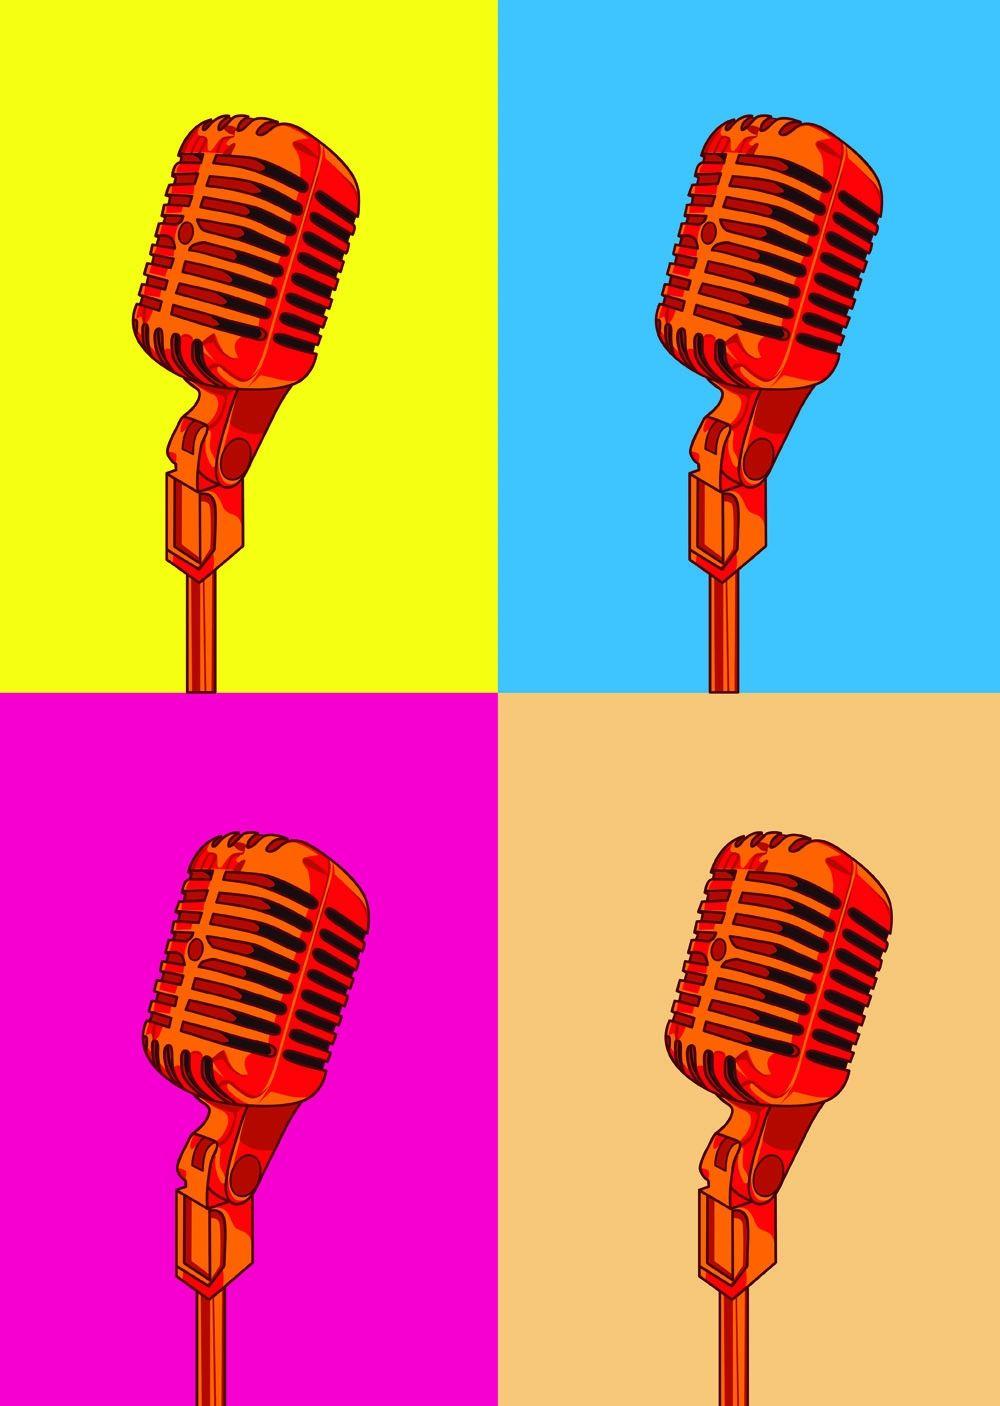 Pop Art Vintage Microphone Red Hardtofind Pop Art Vintage Microphone Vintage Poster Art